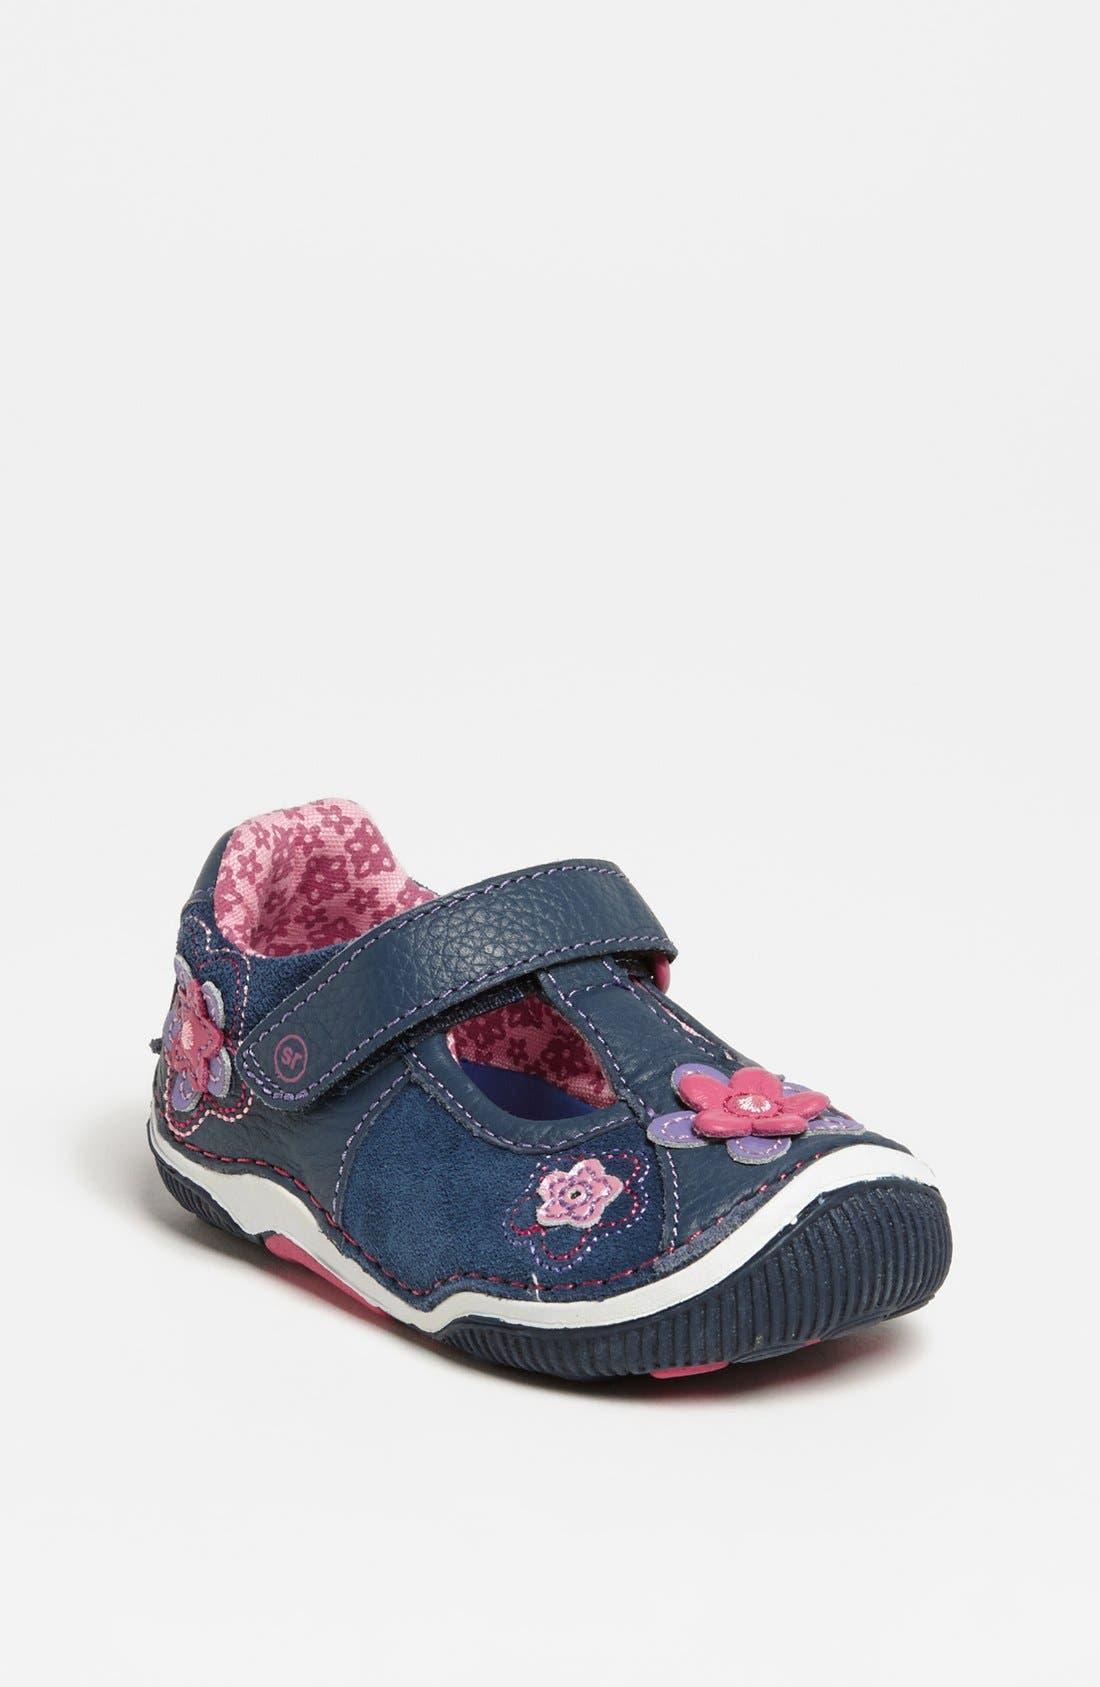 Main Image - Stride Rite 'Meadow' Sneaker (Baby, Walker & Toddler)